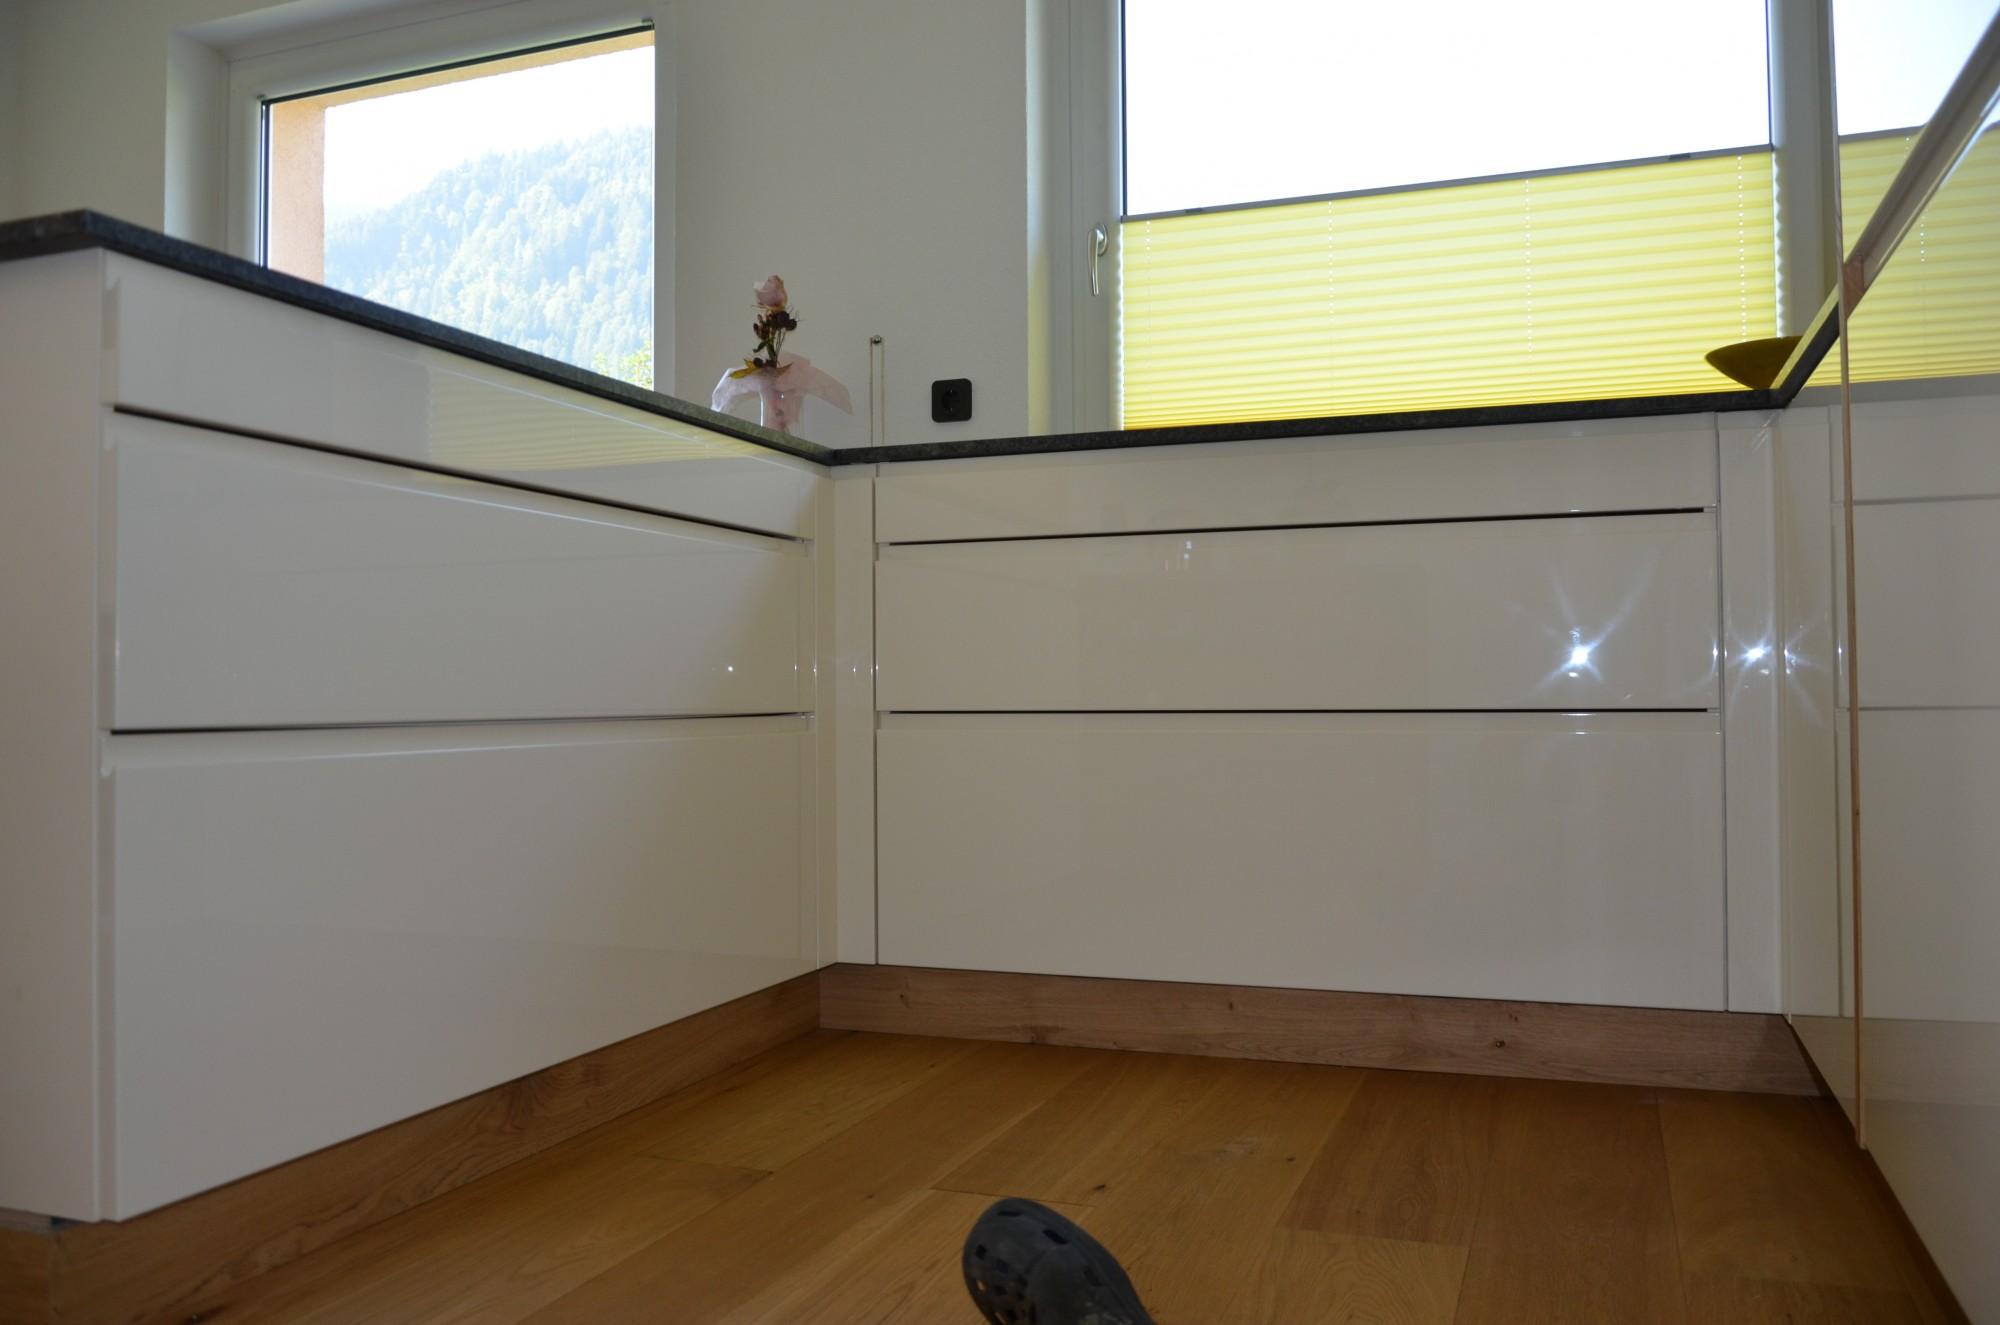 k che magnolia holz nobilia k che magnolia nobilia k che magnolia hochglanz. Black Bedroom Furniture Sets. Home Design Ideas